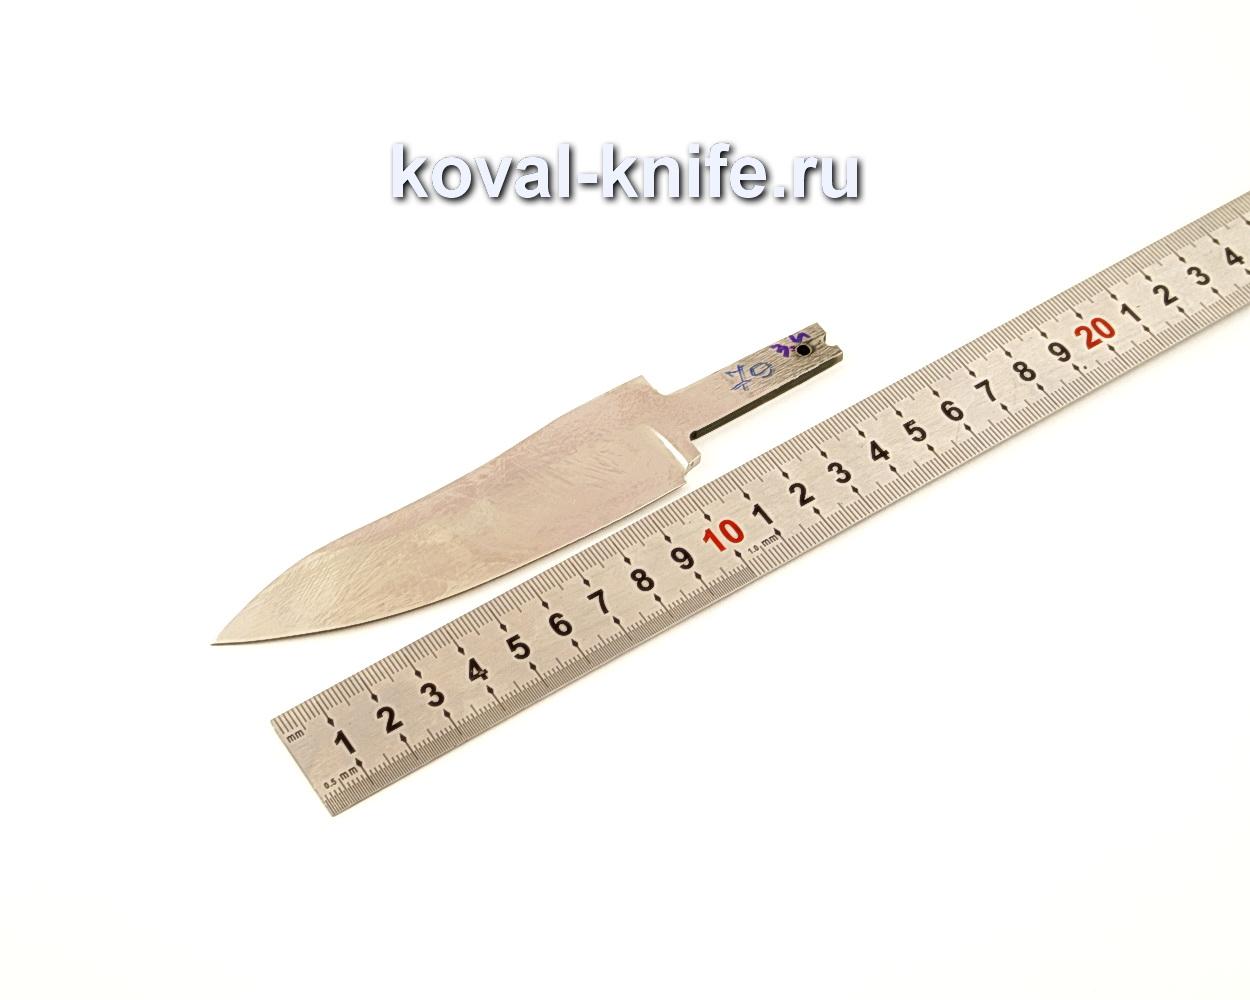 Клинок для ножа из кованой стали Х12МФ N79